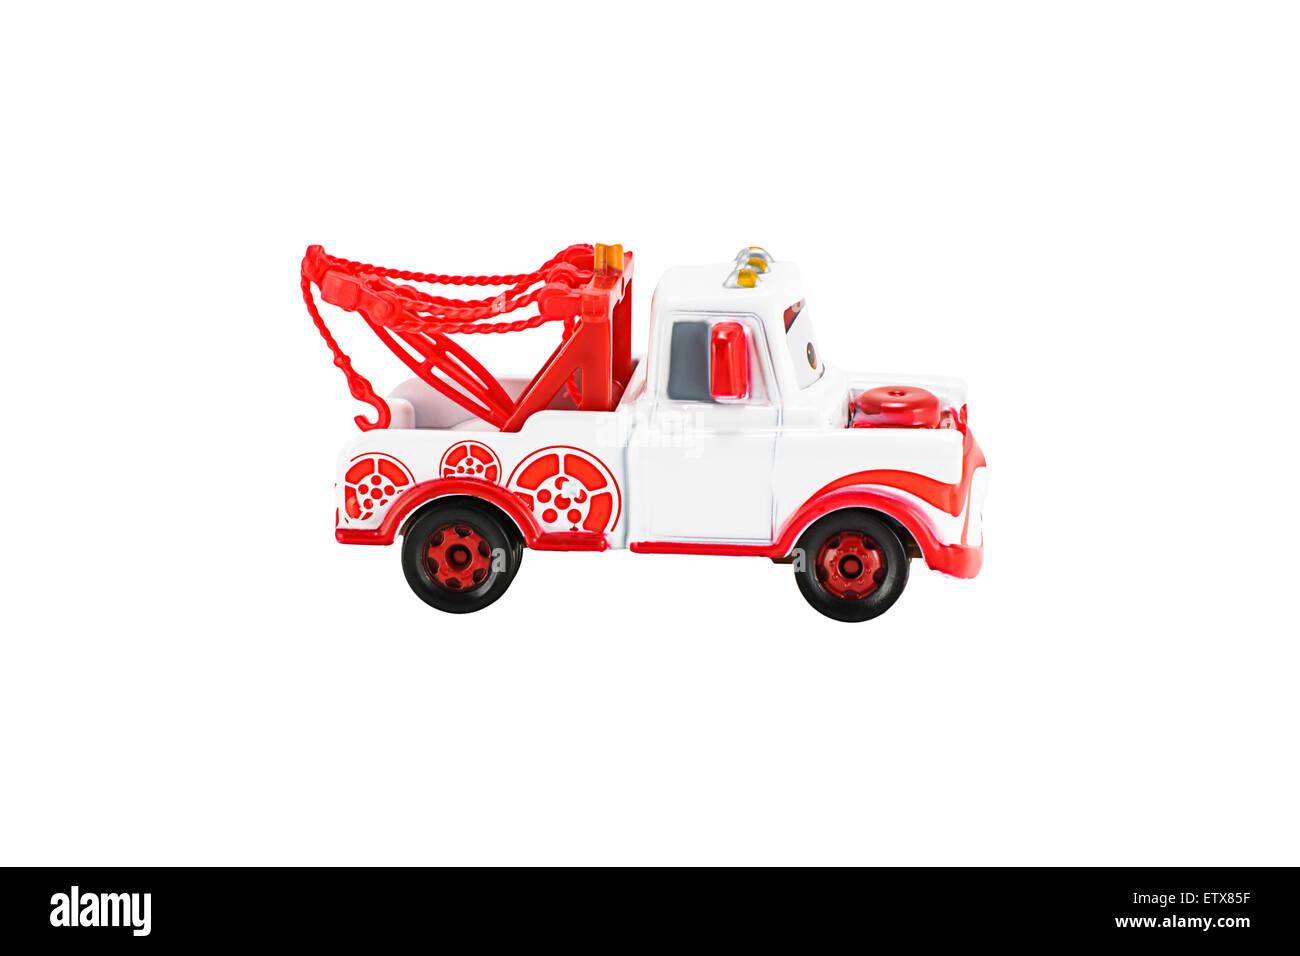 Bangkok,Thailand - February 05, 2015: Tokyo Mater toy car  Japan version a main protagonist of the Disney Pixar Stock Photo